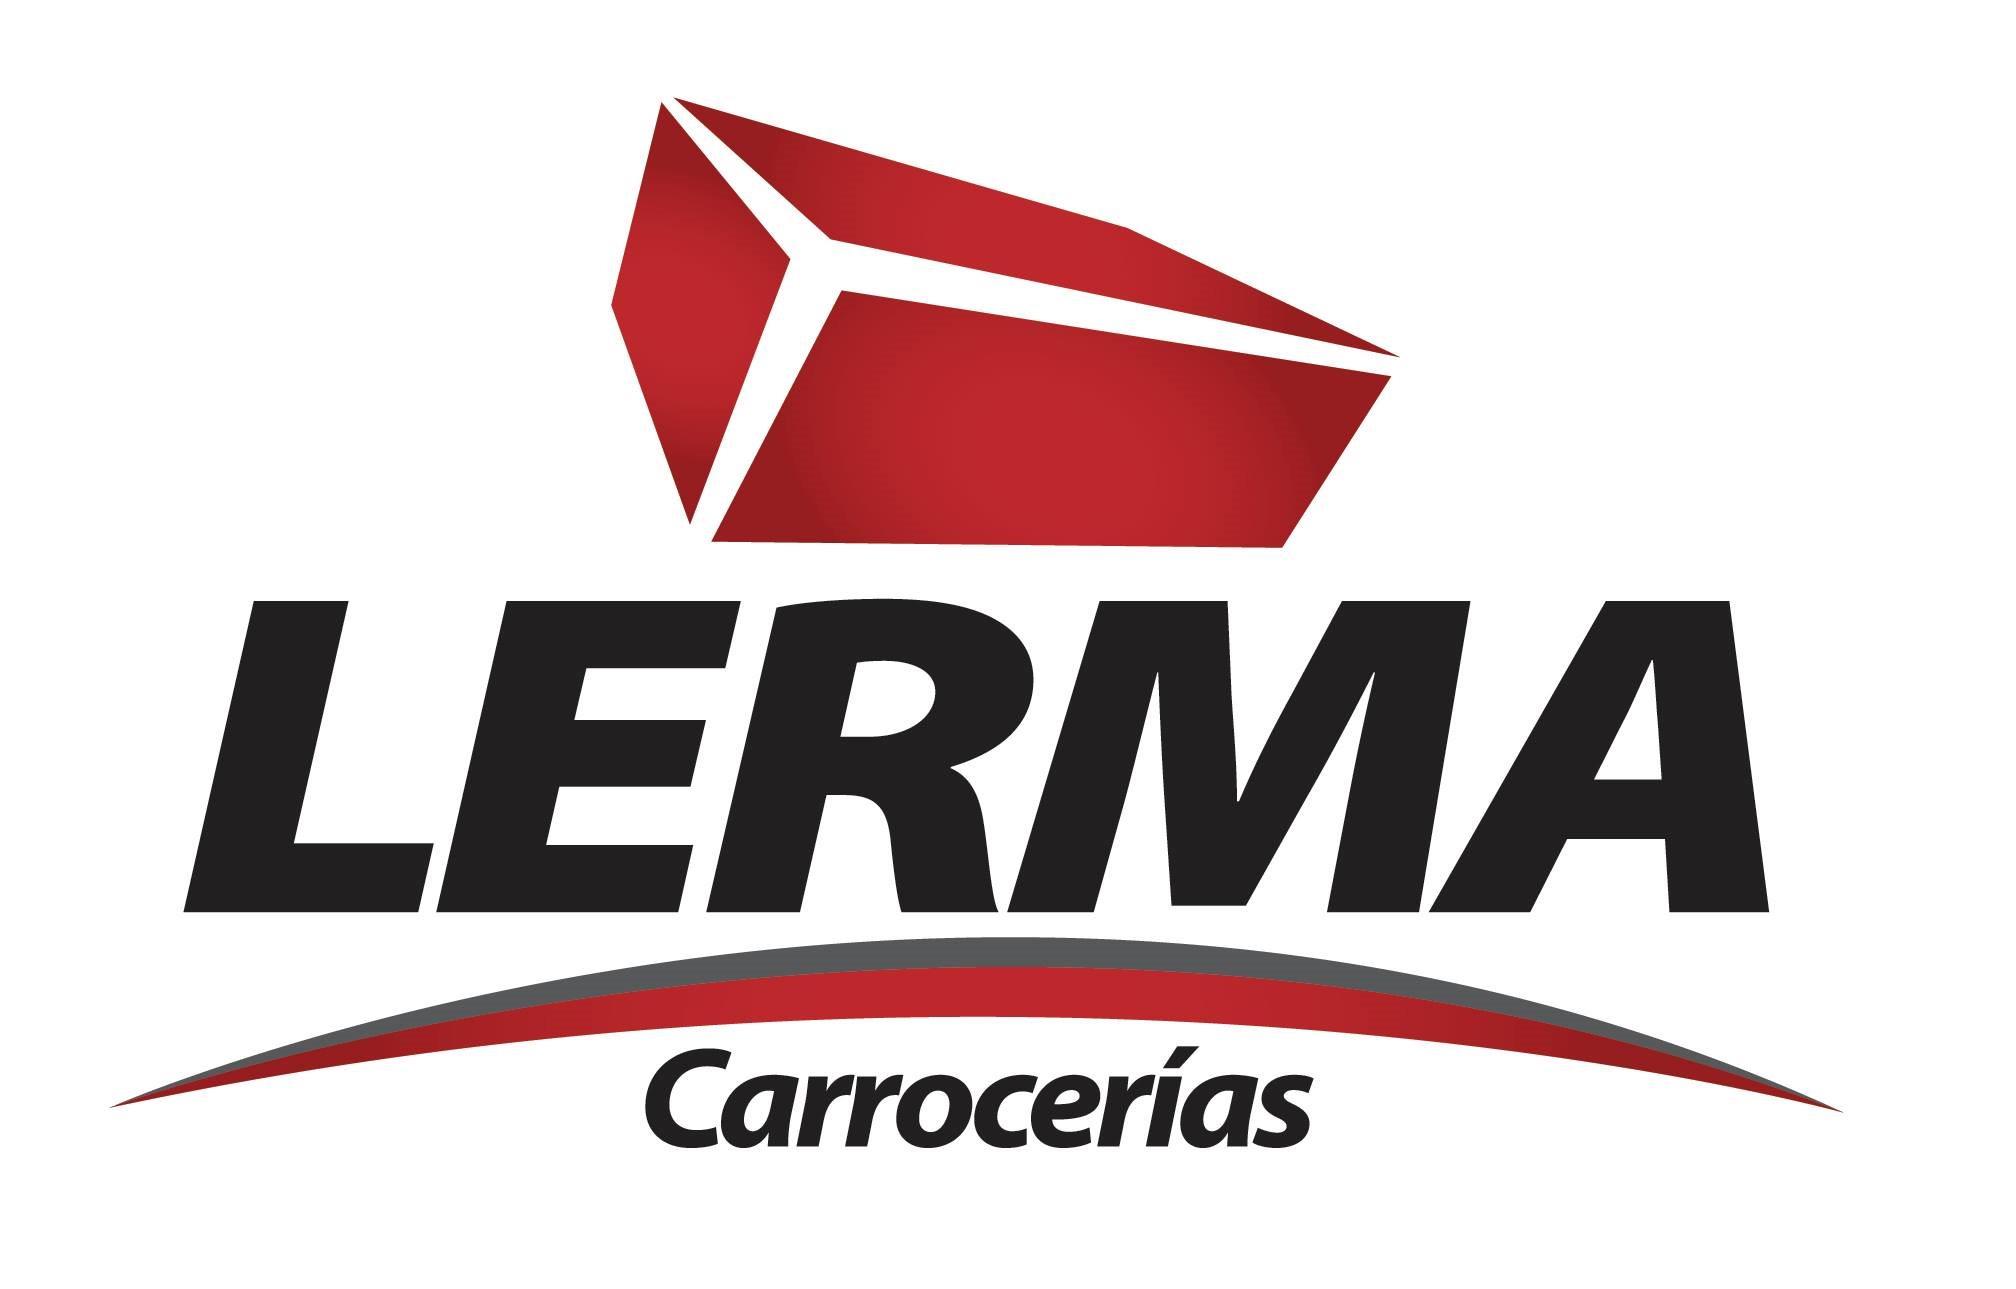 Carrocerías Lerma